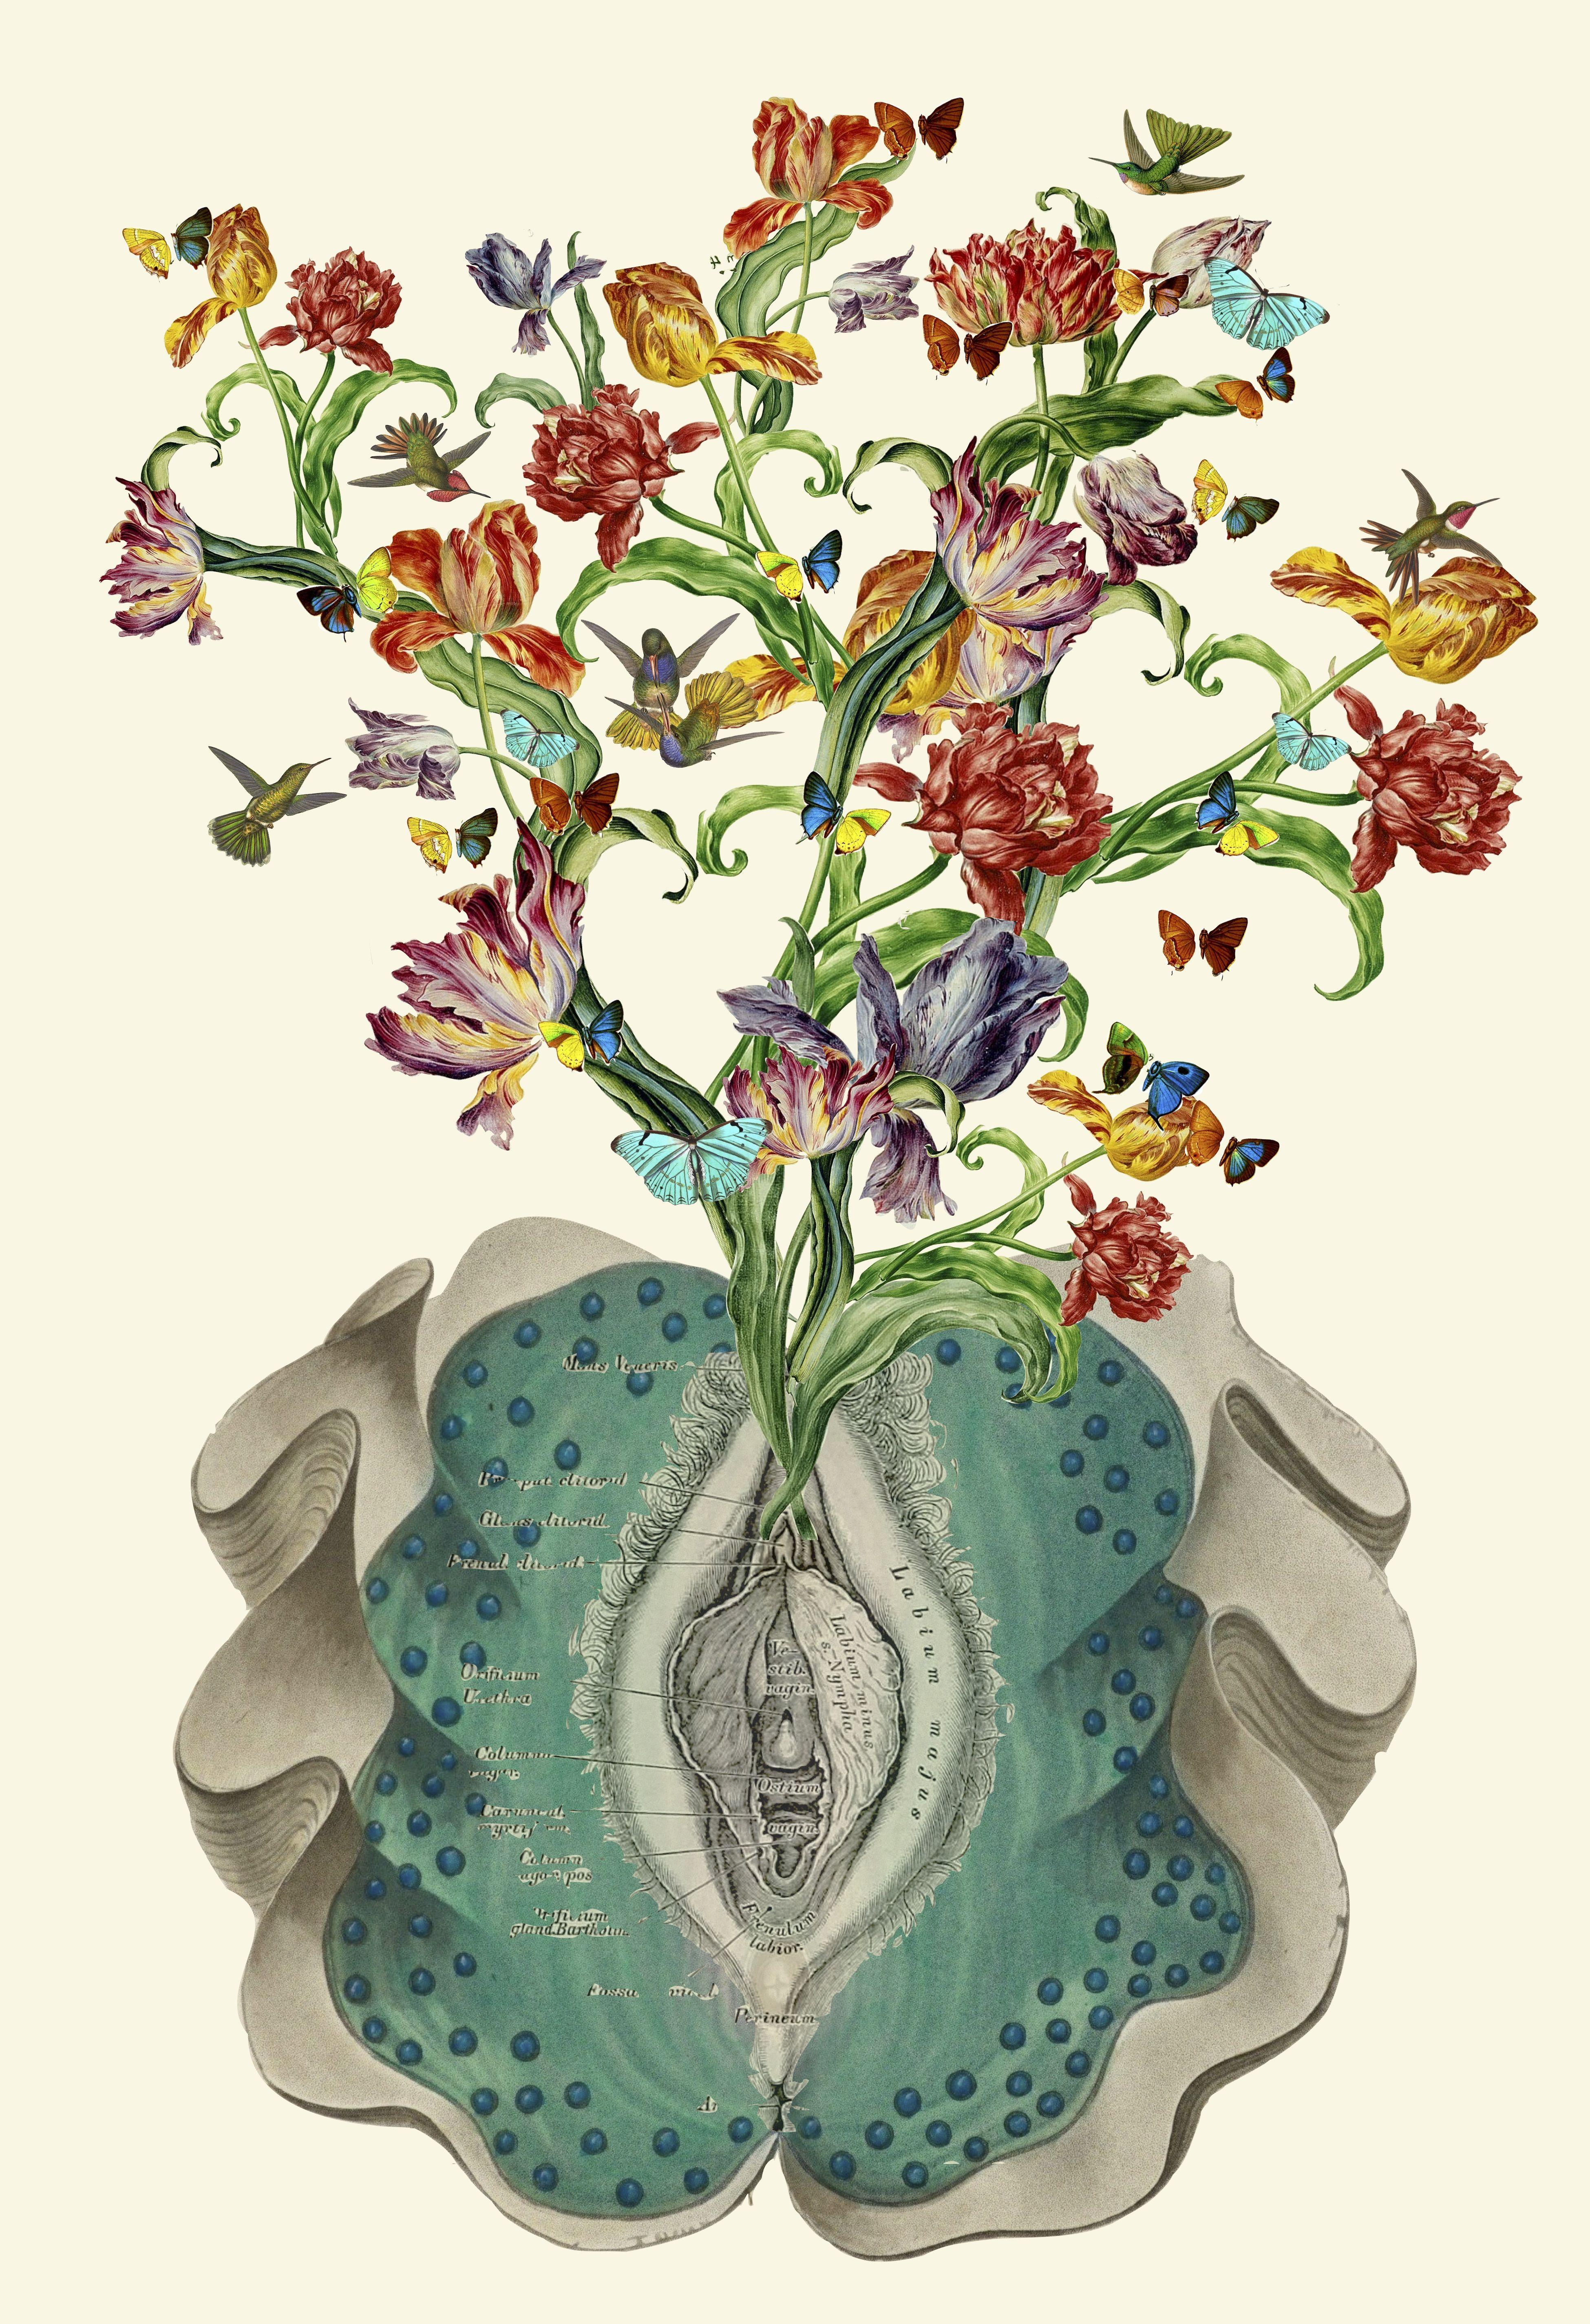 Travis Bedel - Anatomical Collage Studies | Pinterest | Exotic art ...